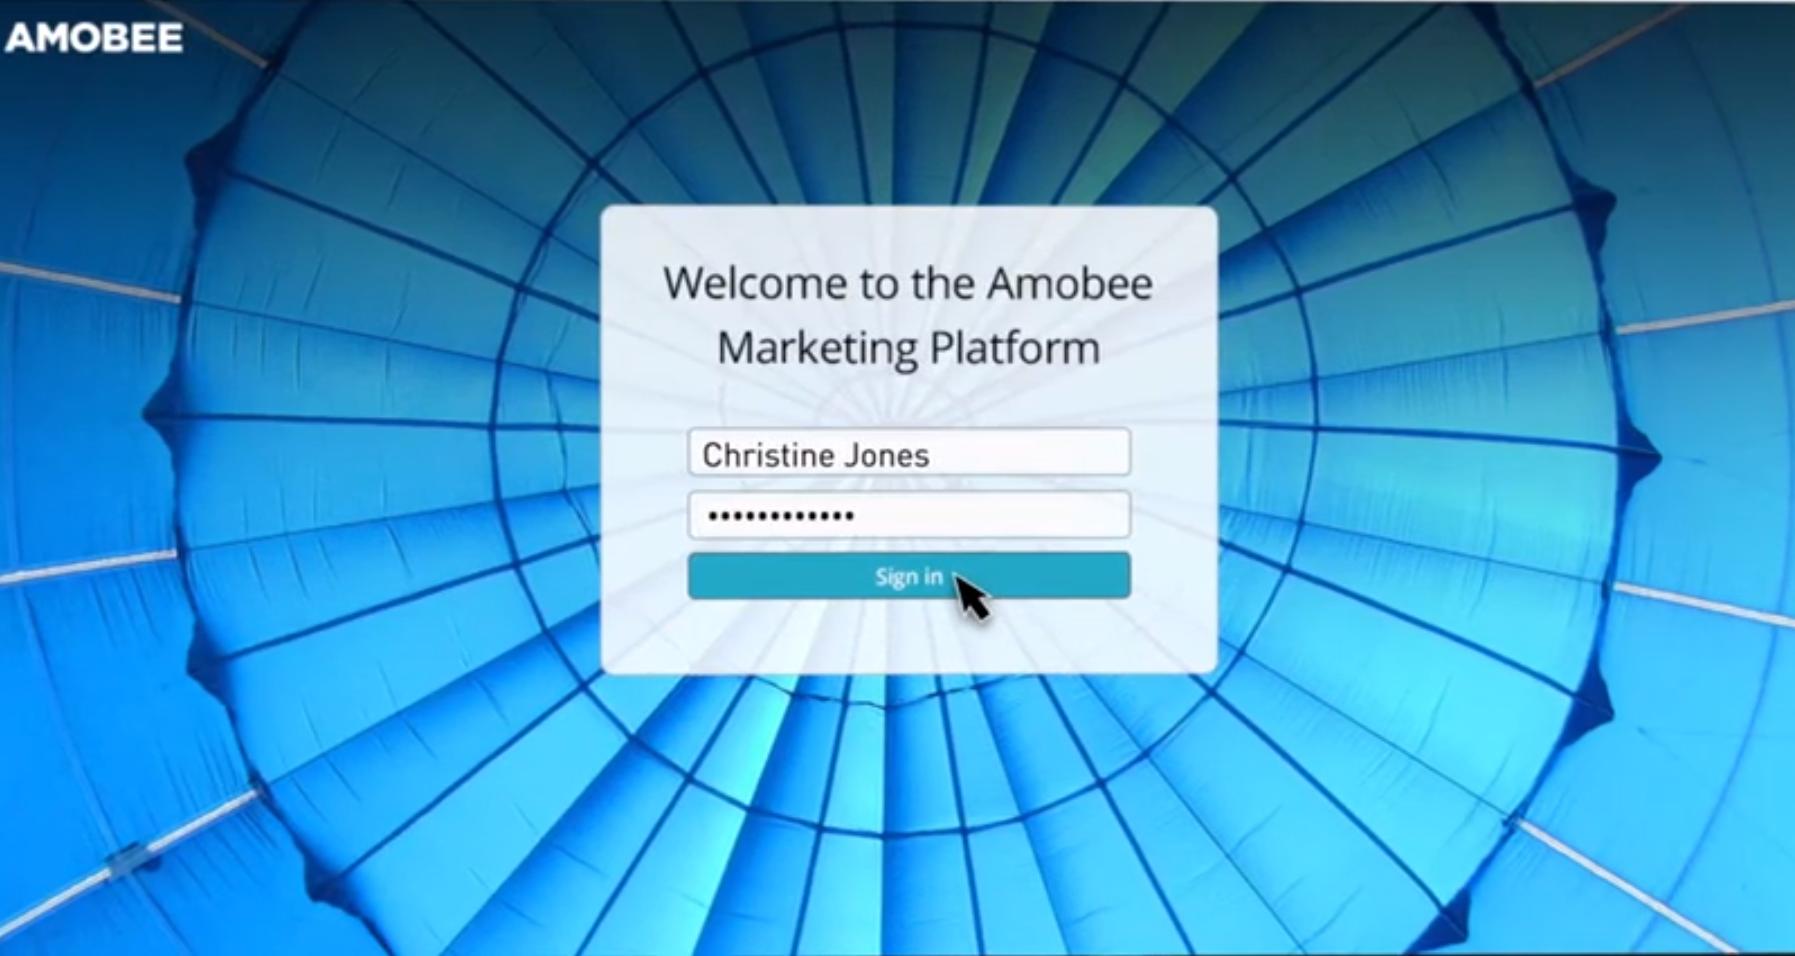 Amobee screenshot: Amobee login page